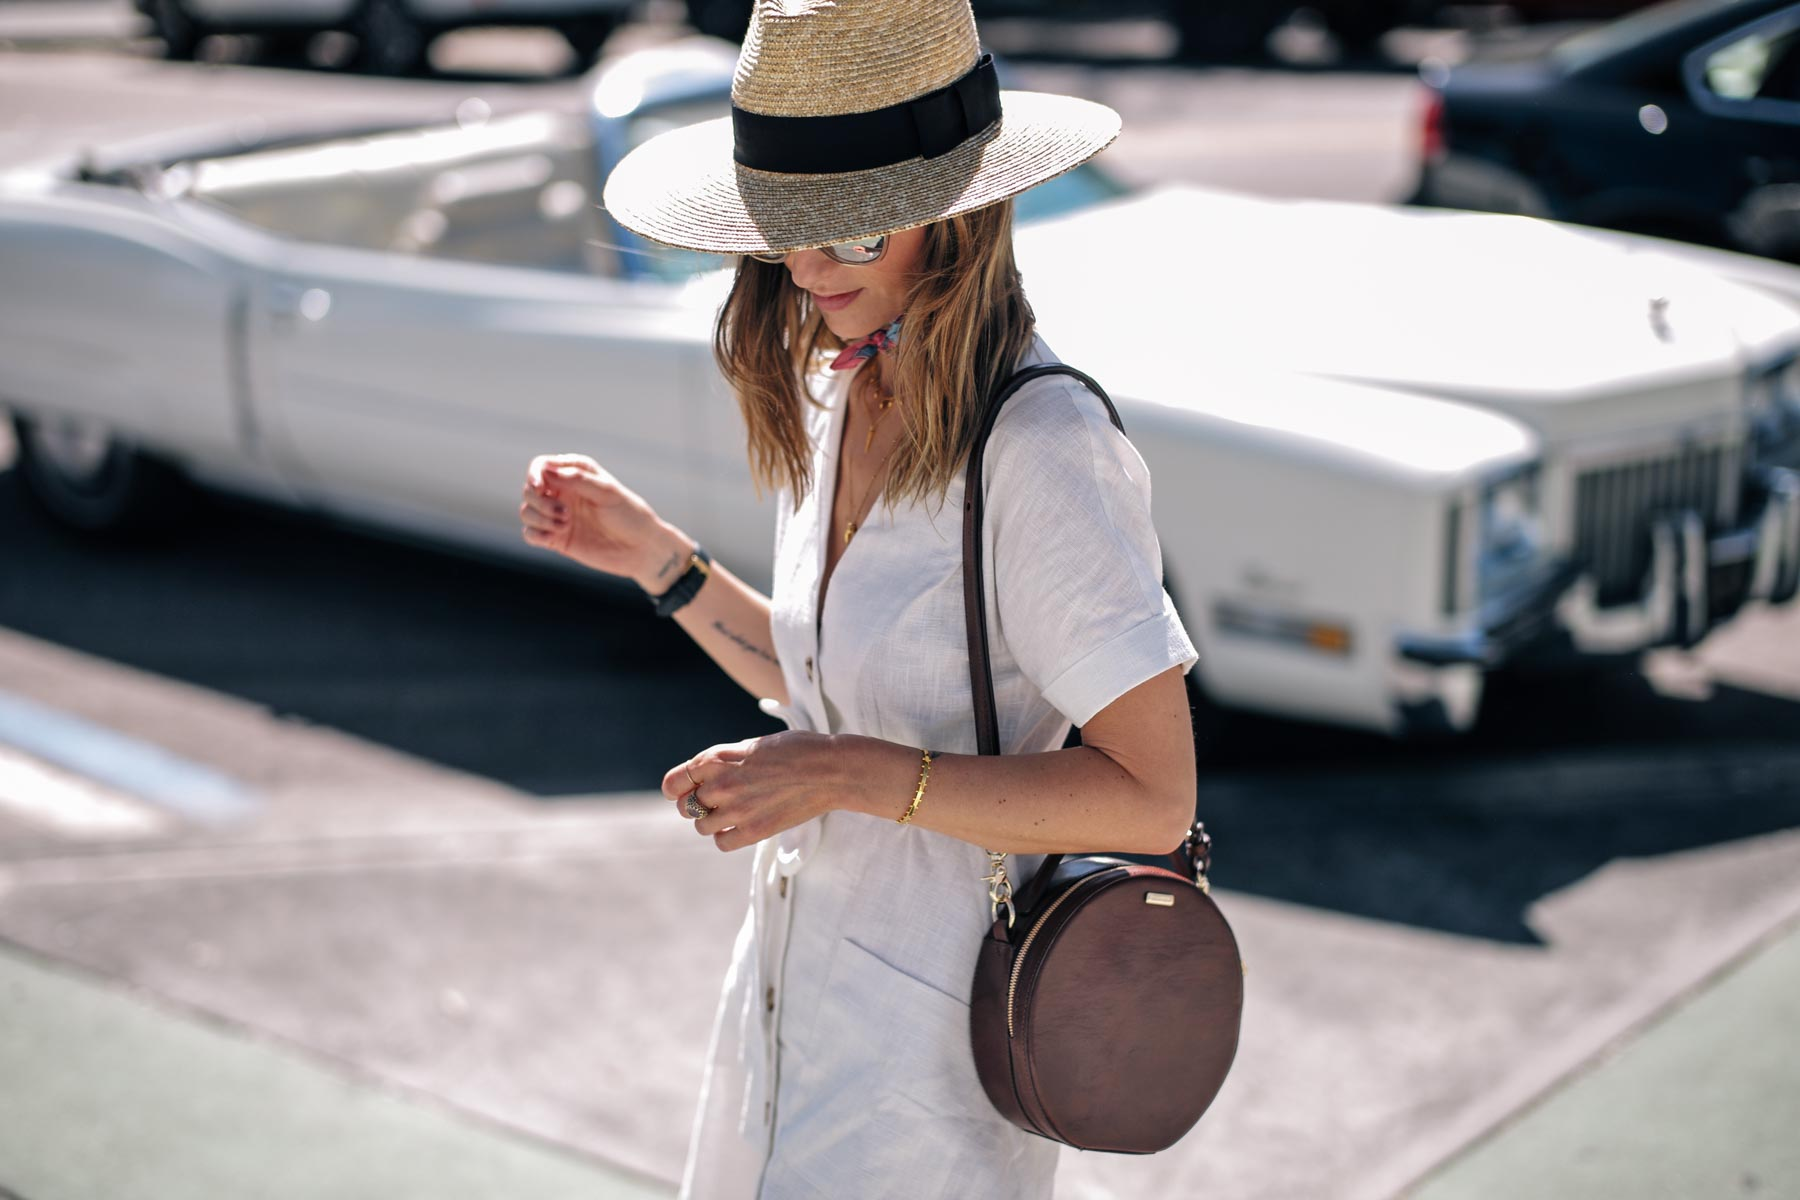 Jess Ann Kirby wears a Moon River Linen Dress and Brahmin Lane Crossbody bag in Saint Petersburg, Florida